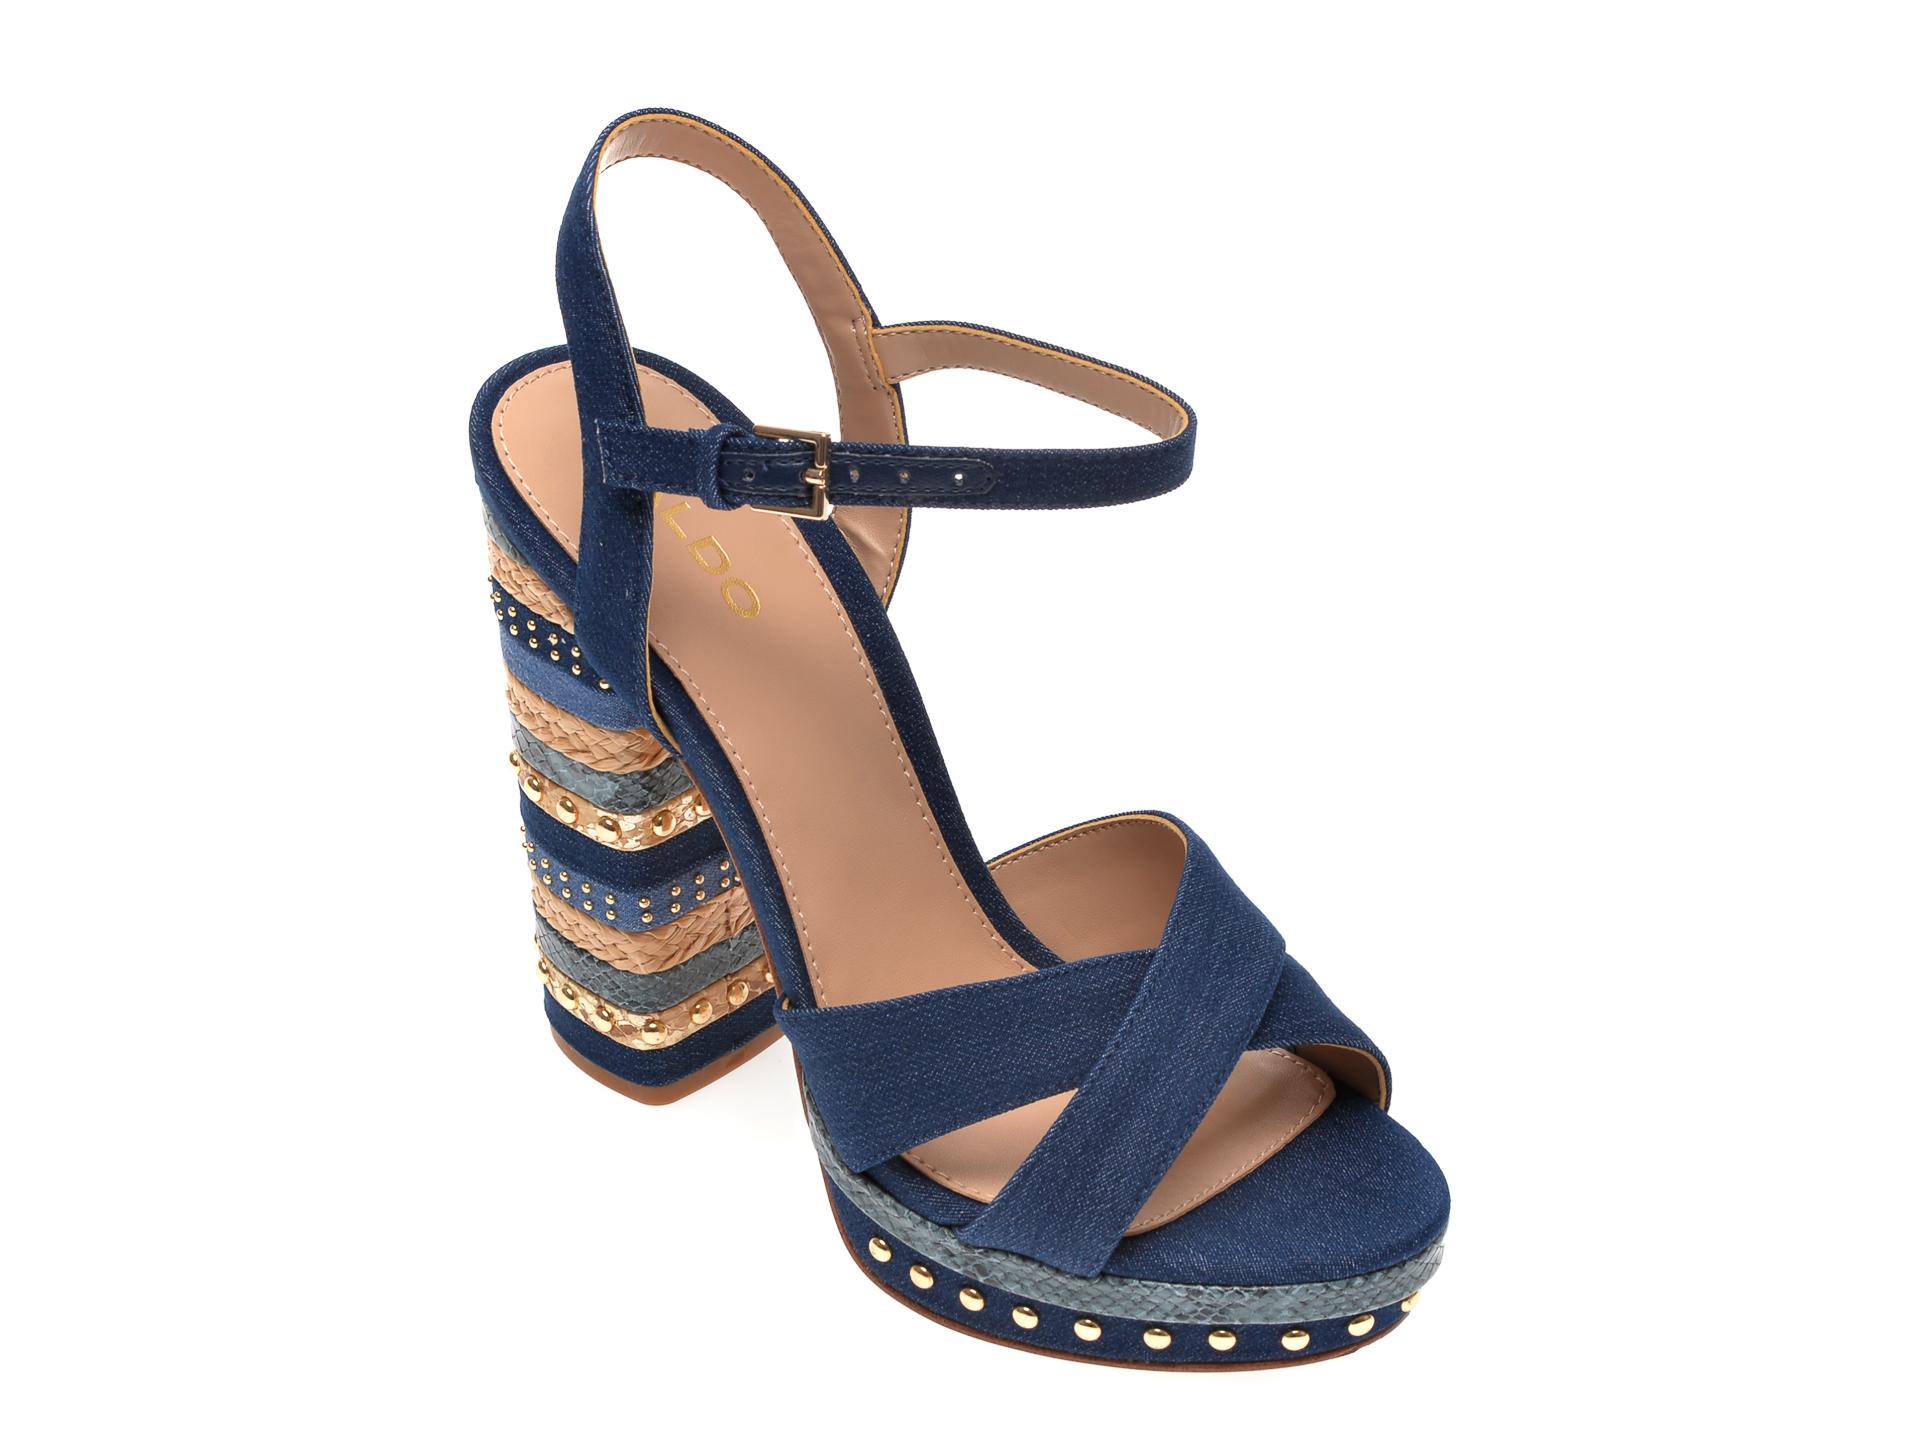 Sandale ALDO bleumarin, Hugs401, din material textil New